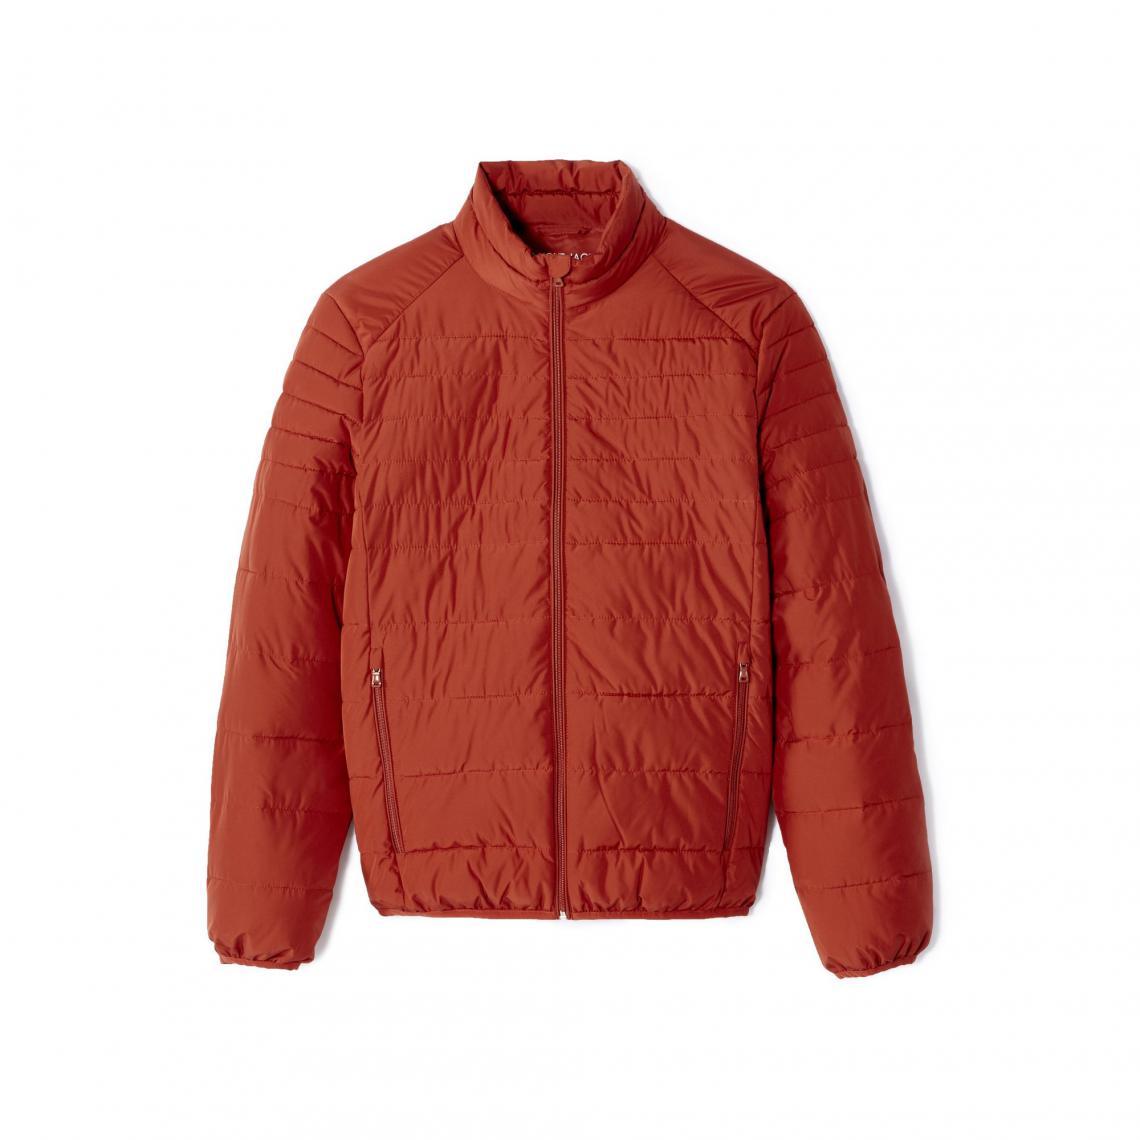 Celio Doudoune Montant Light Orange 3suisses Col Homme aWW6I4